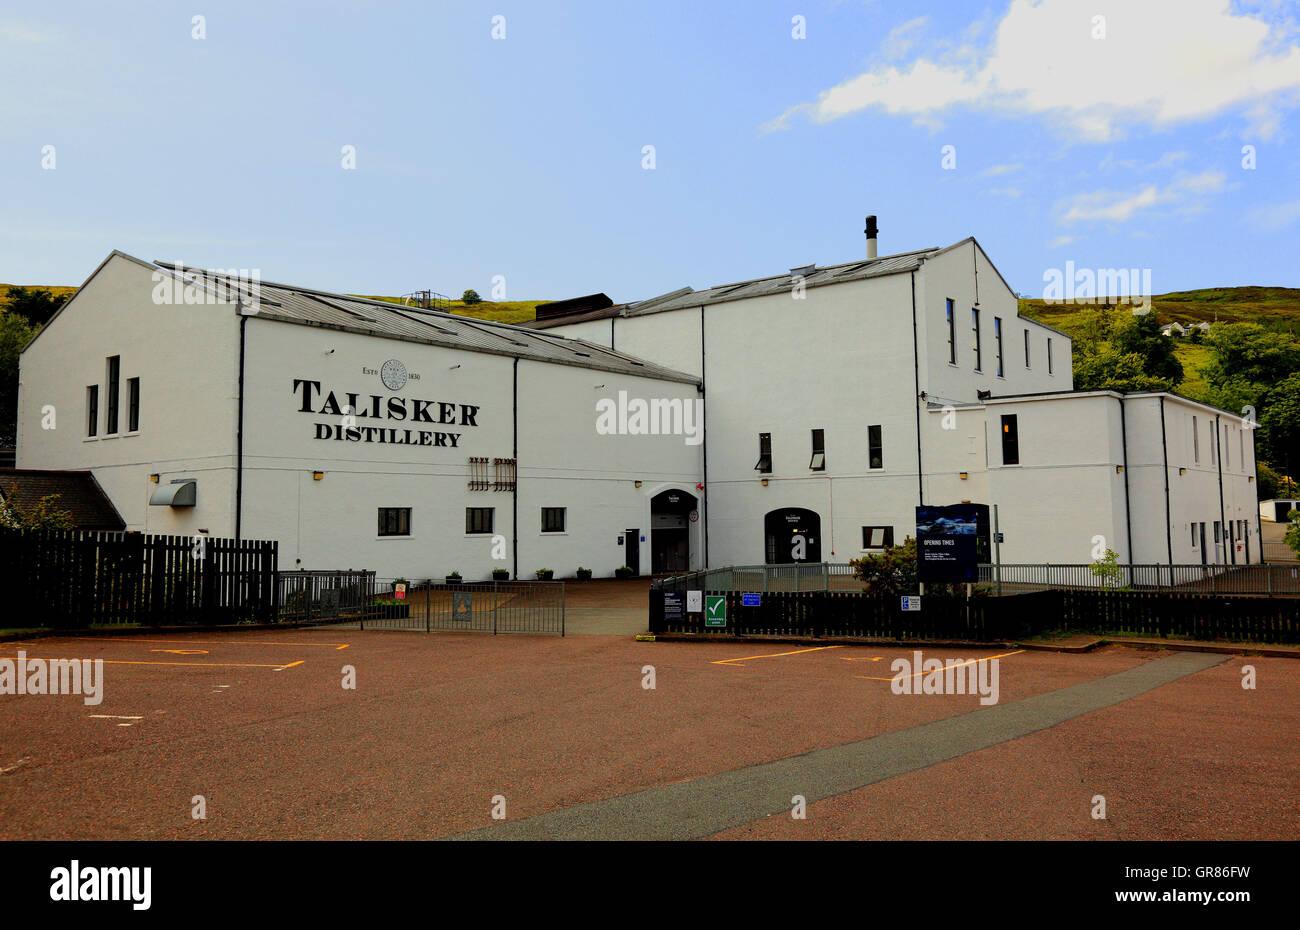 Scotland, the Inner Hebrides, Isle of Skye, Minginish peninsula, building the Talisker whisky Distillery Stock Photo